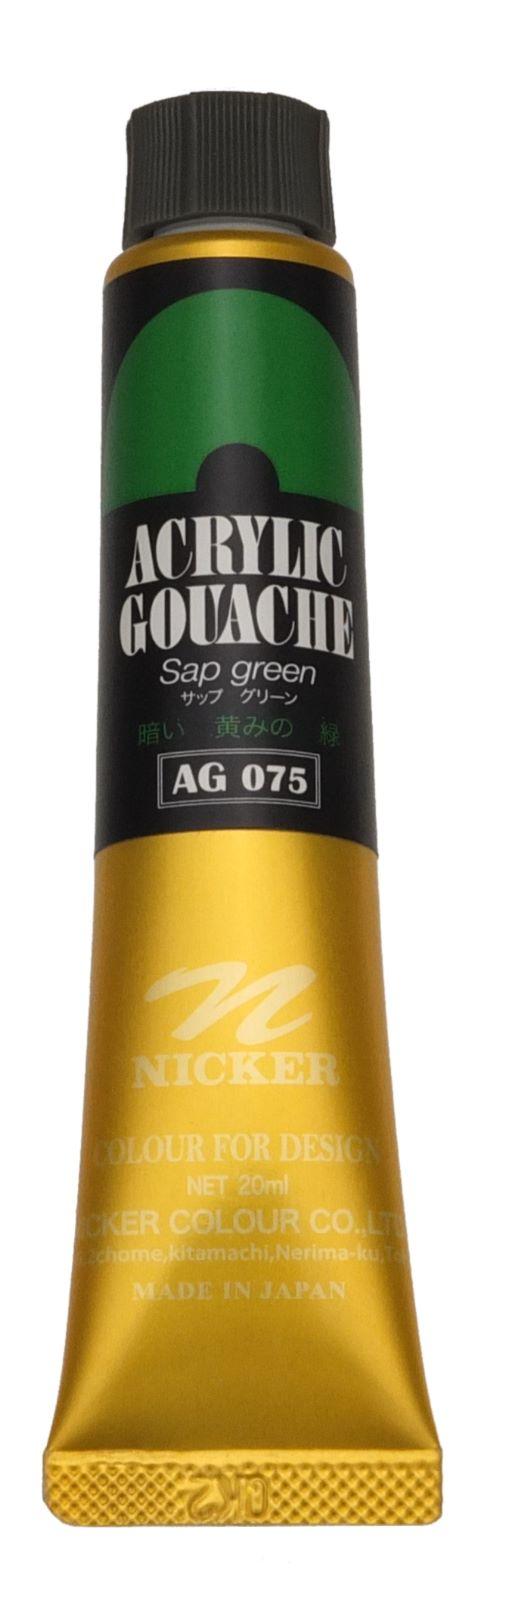 <Discontinued> ACRYLIC GOUACHE 20ml AG075 SAP GREEN